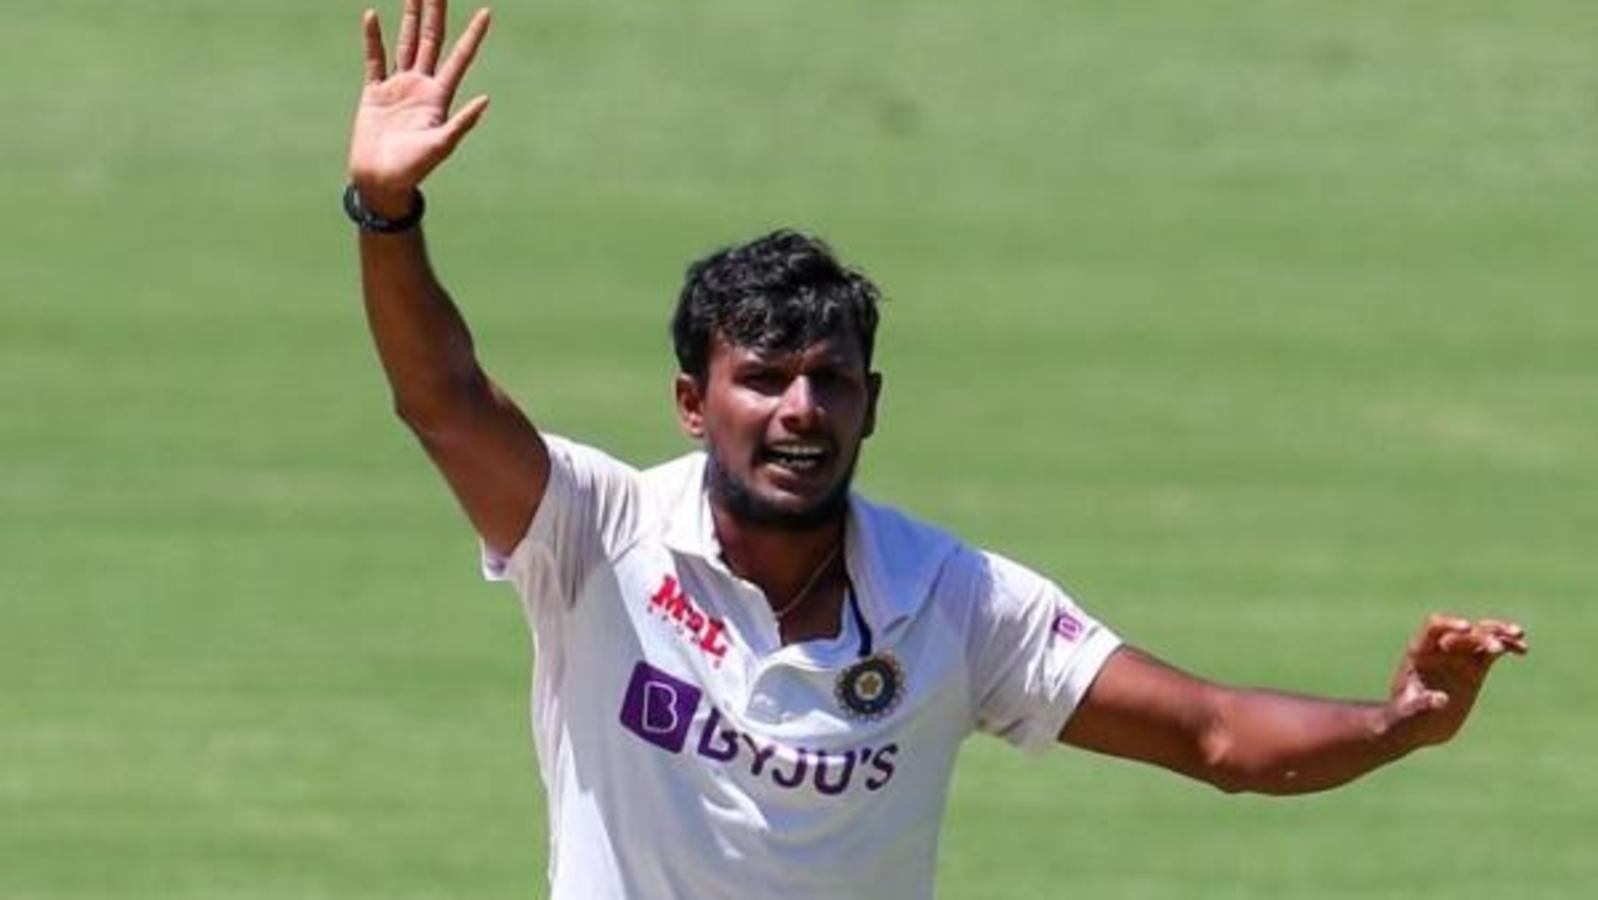 Varun Chakravarthy fails fitness test again, Natarajan at NCA with shoulder niggle - Hindustan Times